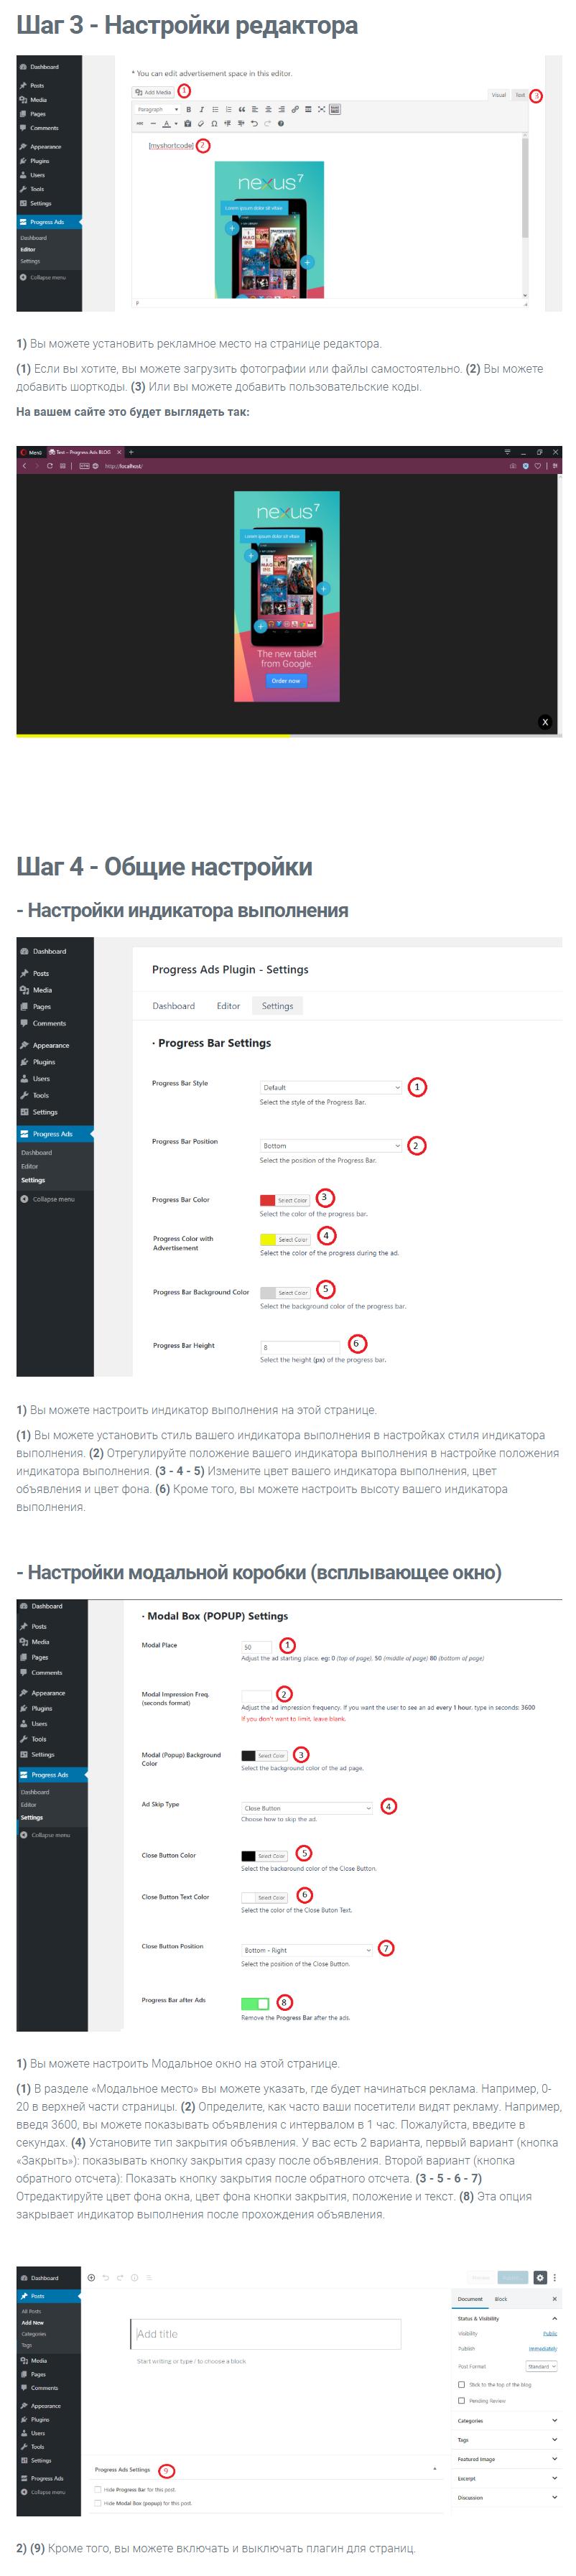 screenshot-premium.divcoder.com-2019.08.02-09_31_28.png